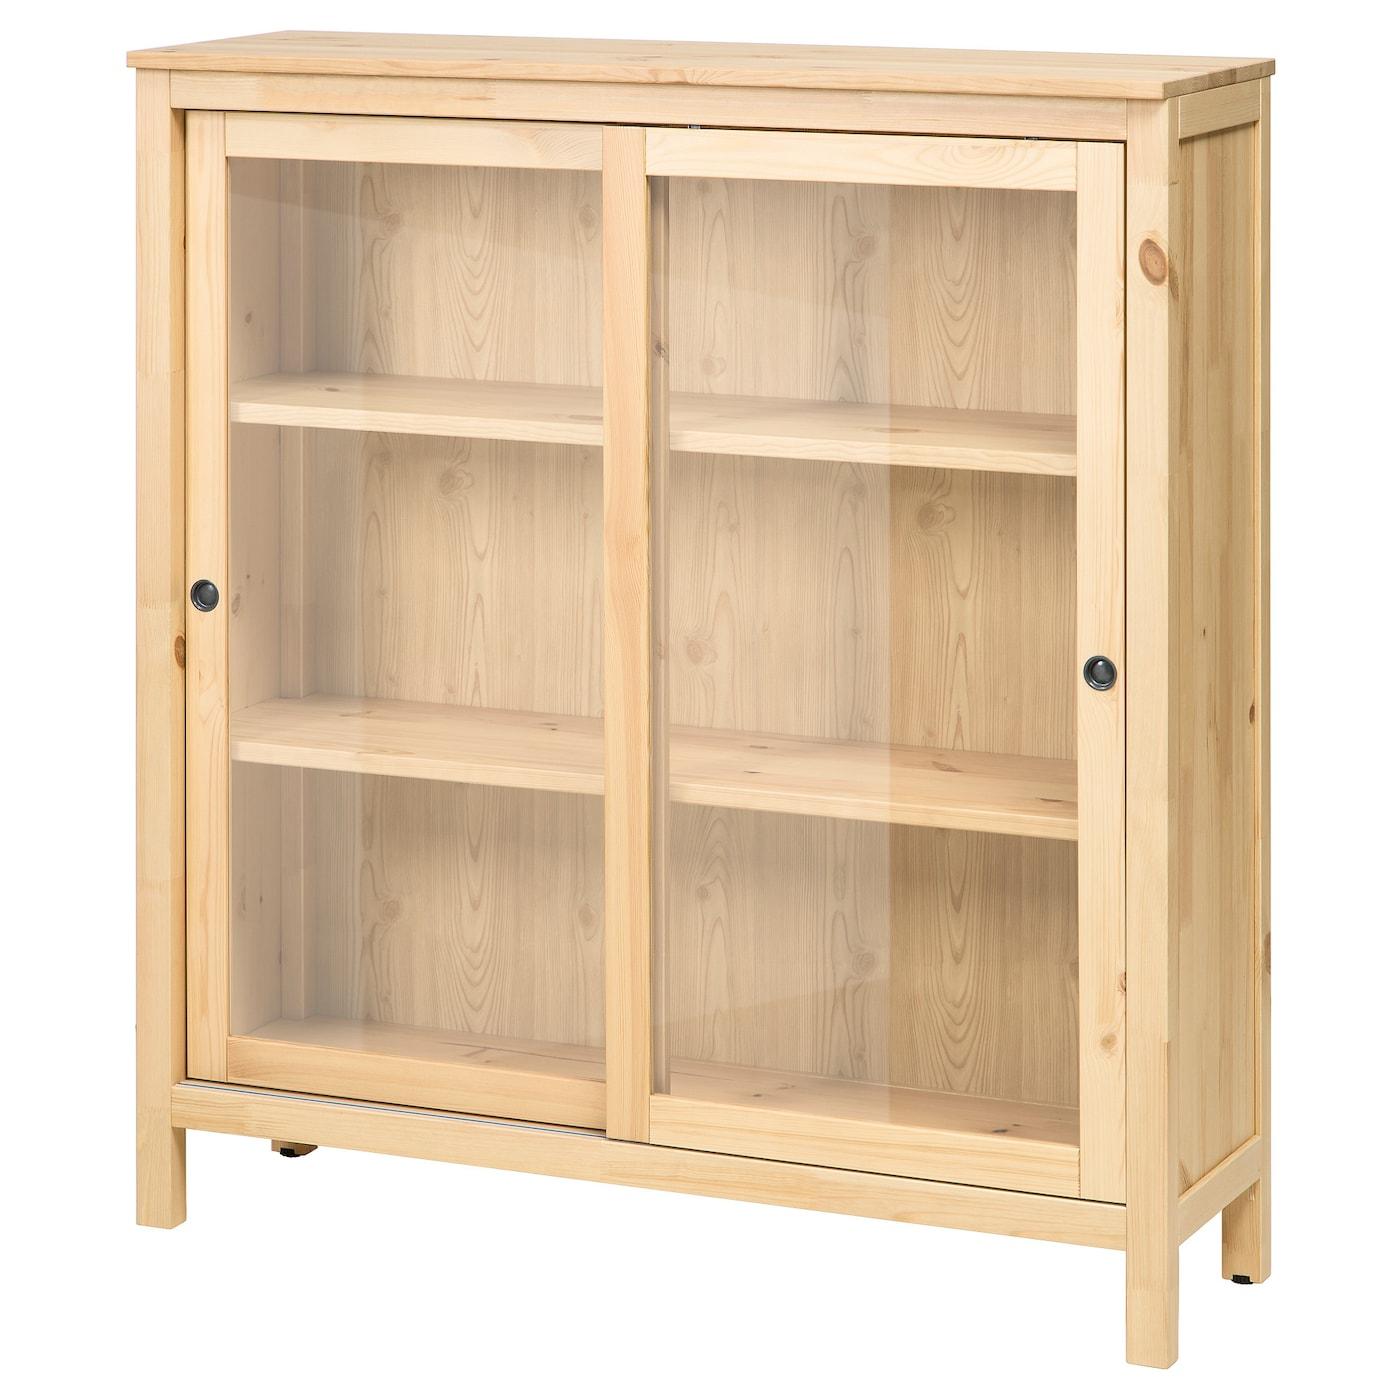 Hemnes Vitrine Brun Clair 120×130 Cm Ikea # Vitrines Murales Ikea